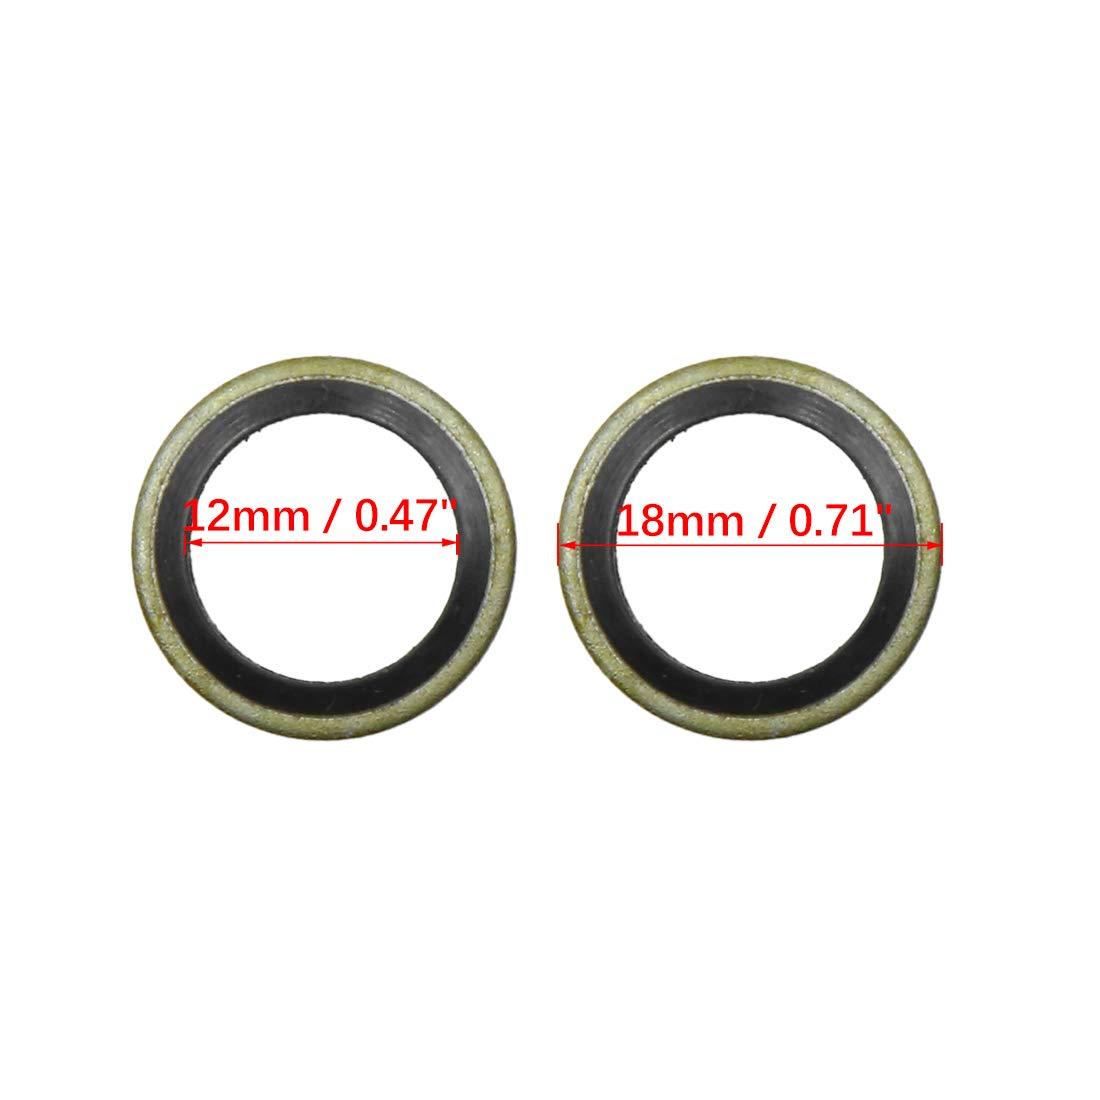 16mm OD for Car X AUTOHAUX 10pcs Engine Oil Crush Washers Drain Plug Gaskets 10mm ID